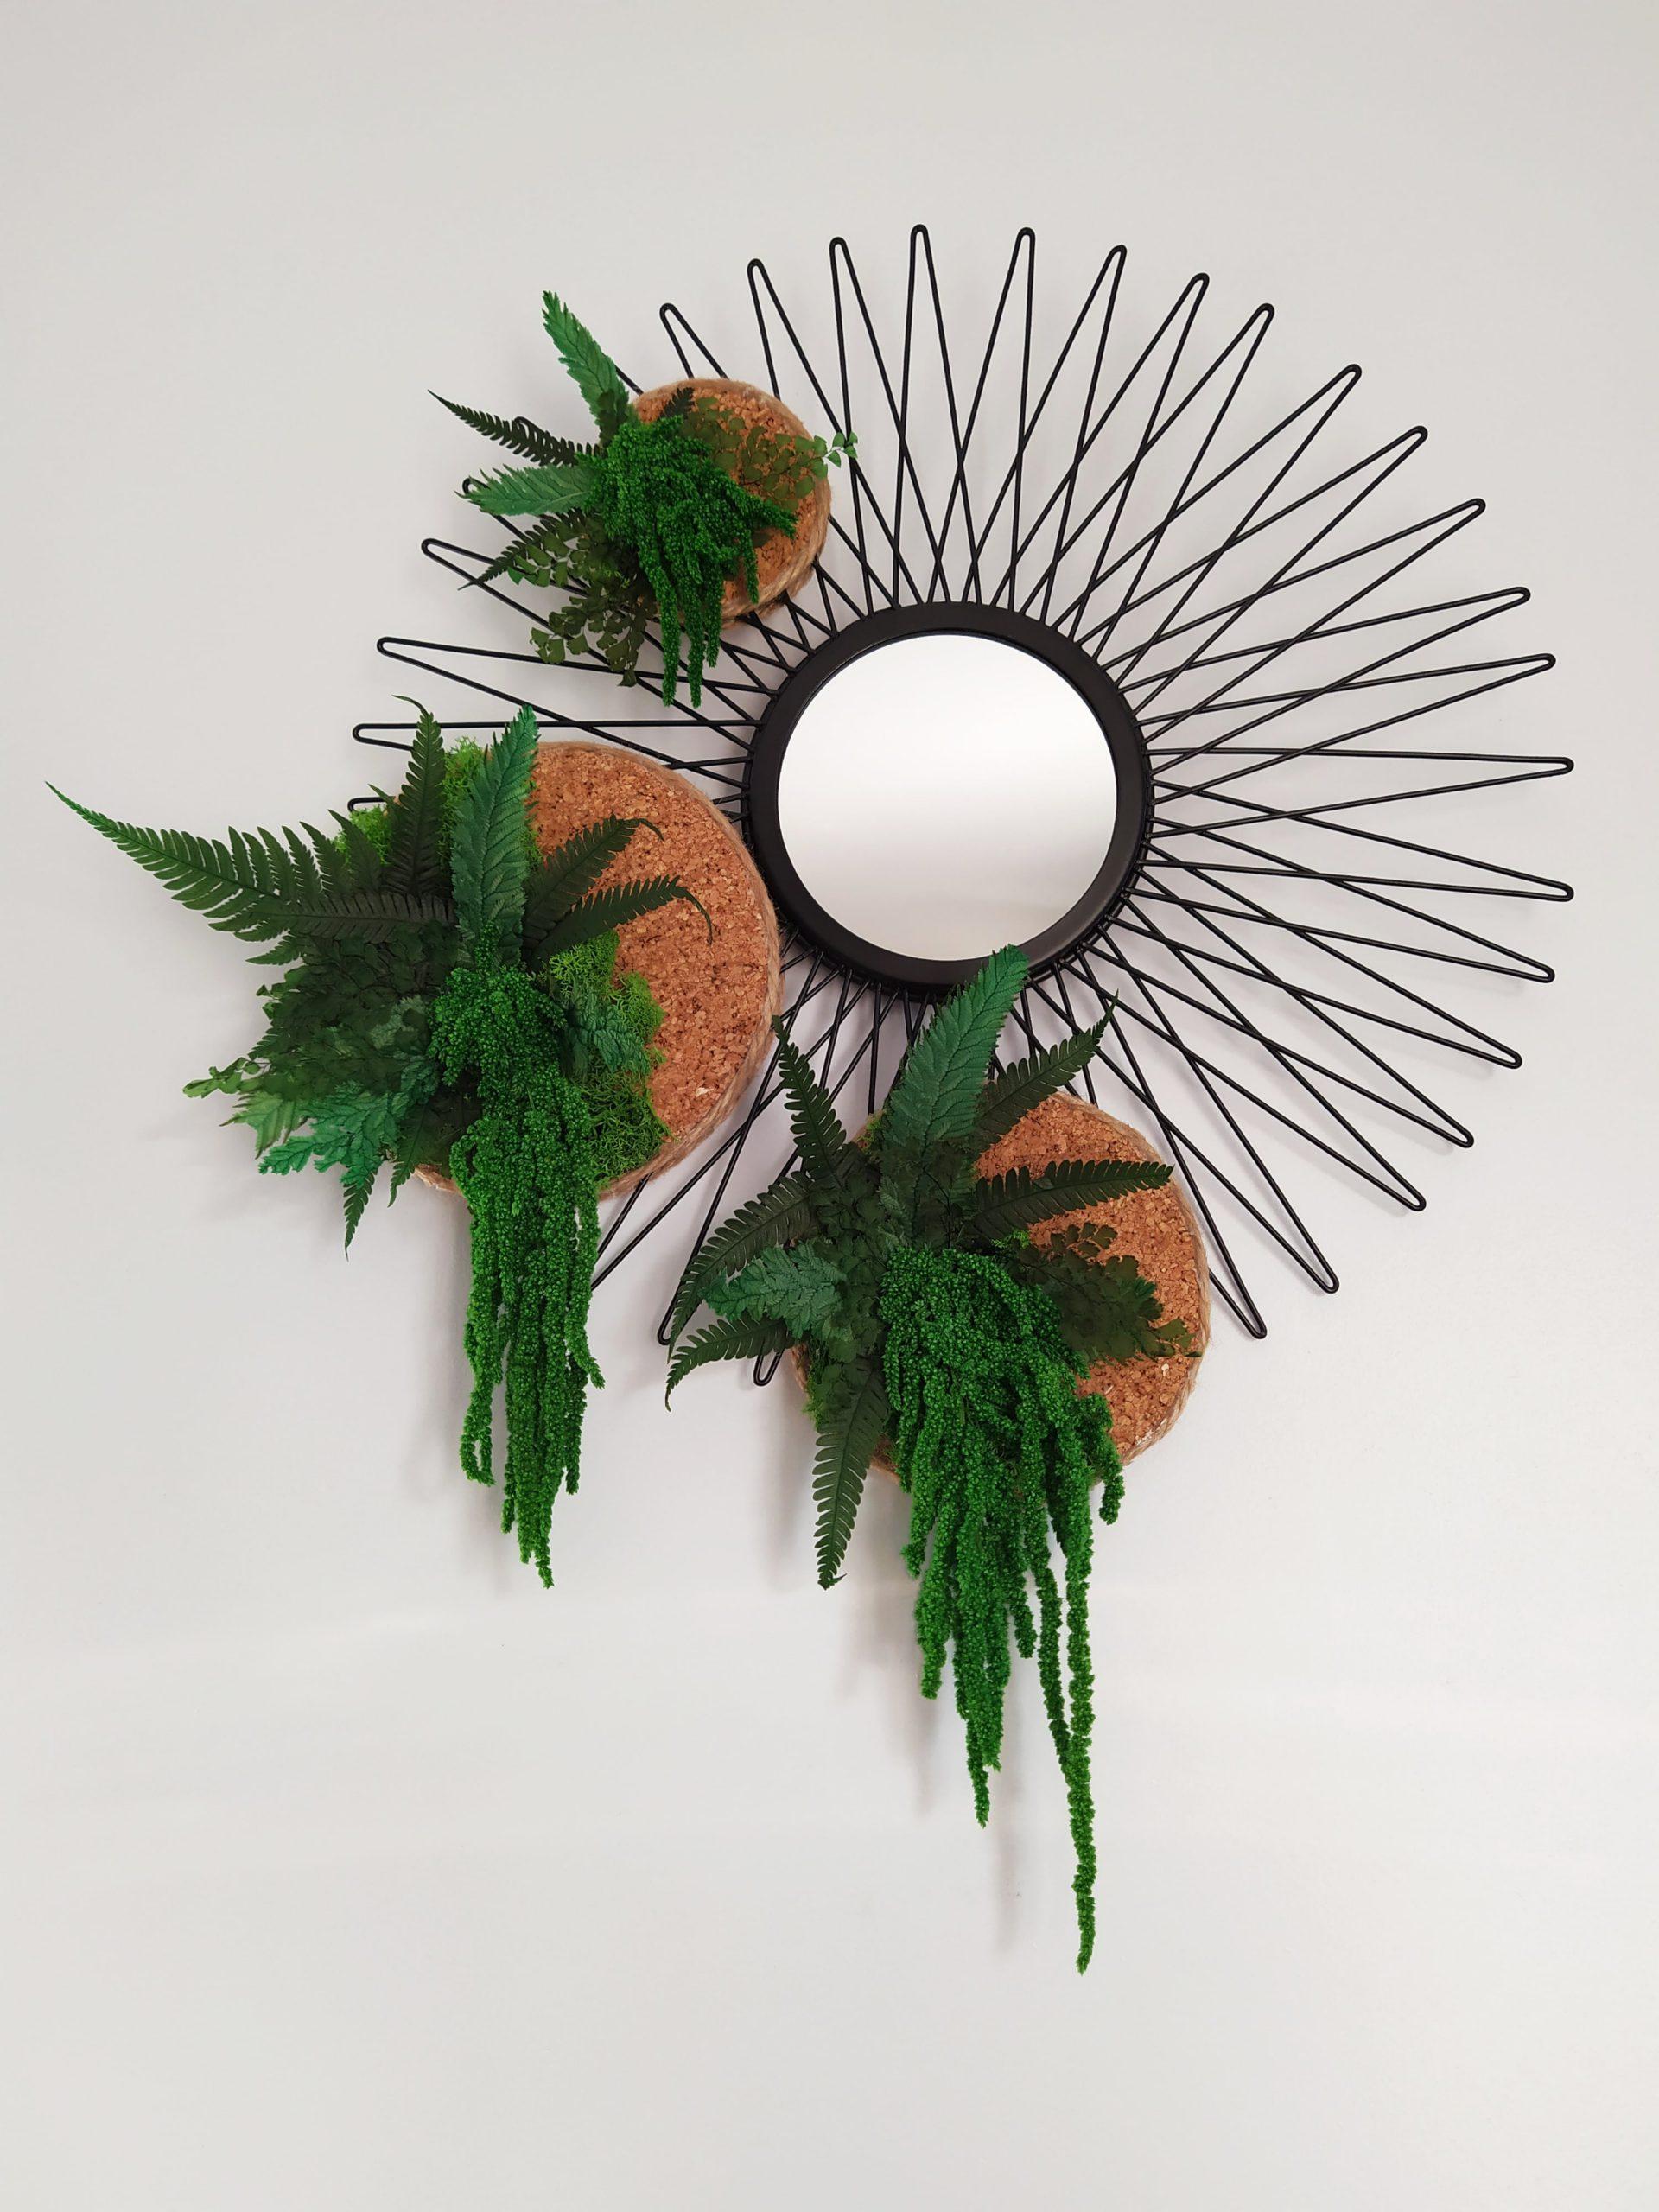 Miroir végétalisé chute-réf.77/78/79